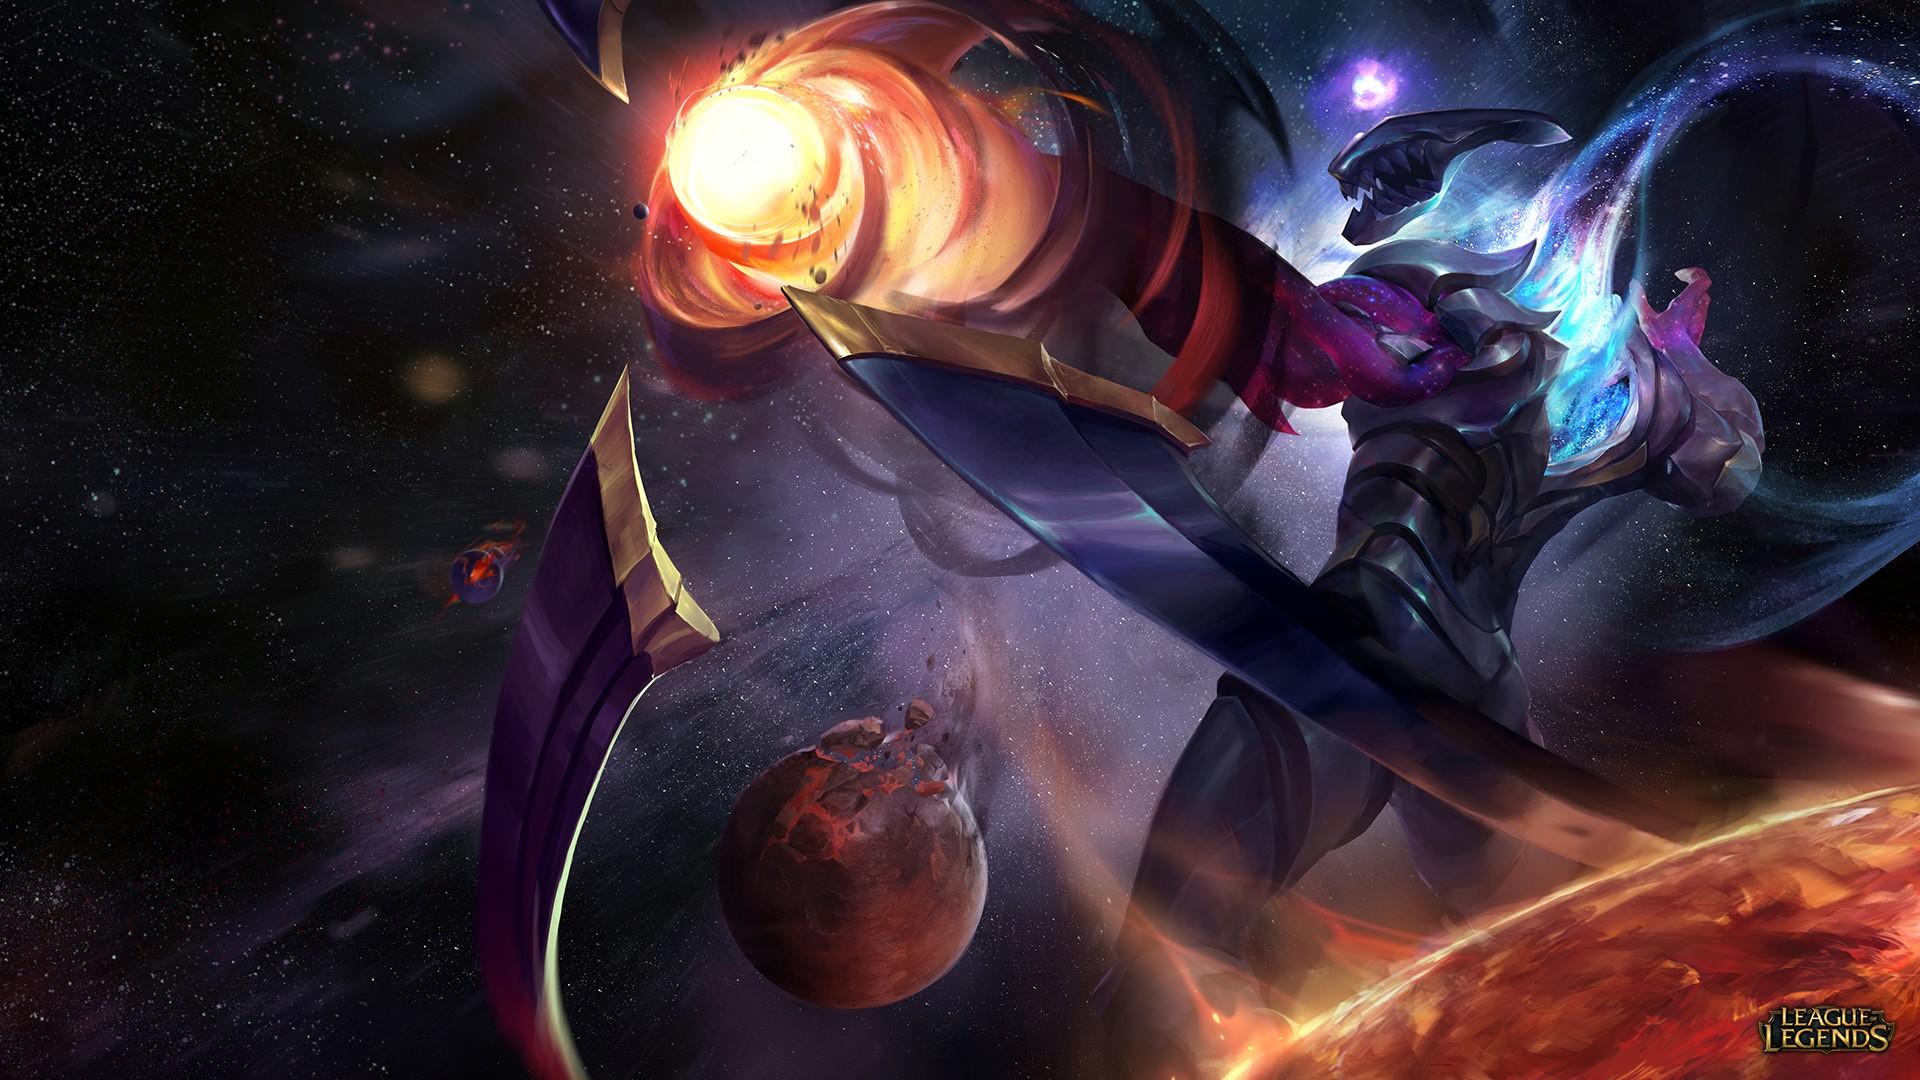 Wallpaper League Of Legends Thresh Varus League Of Legends